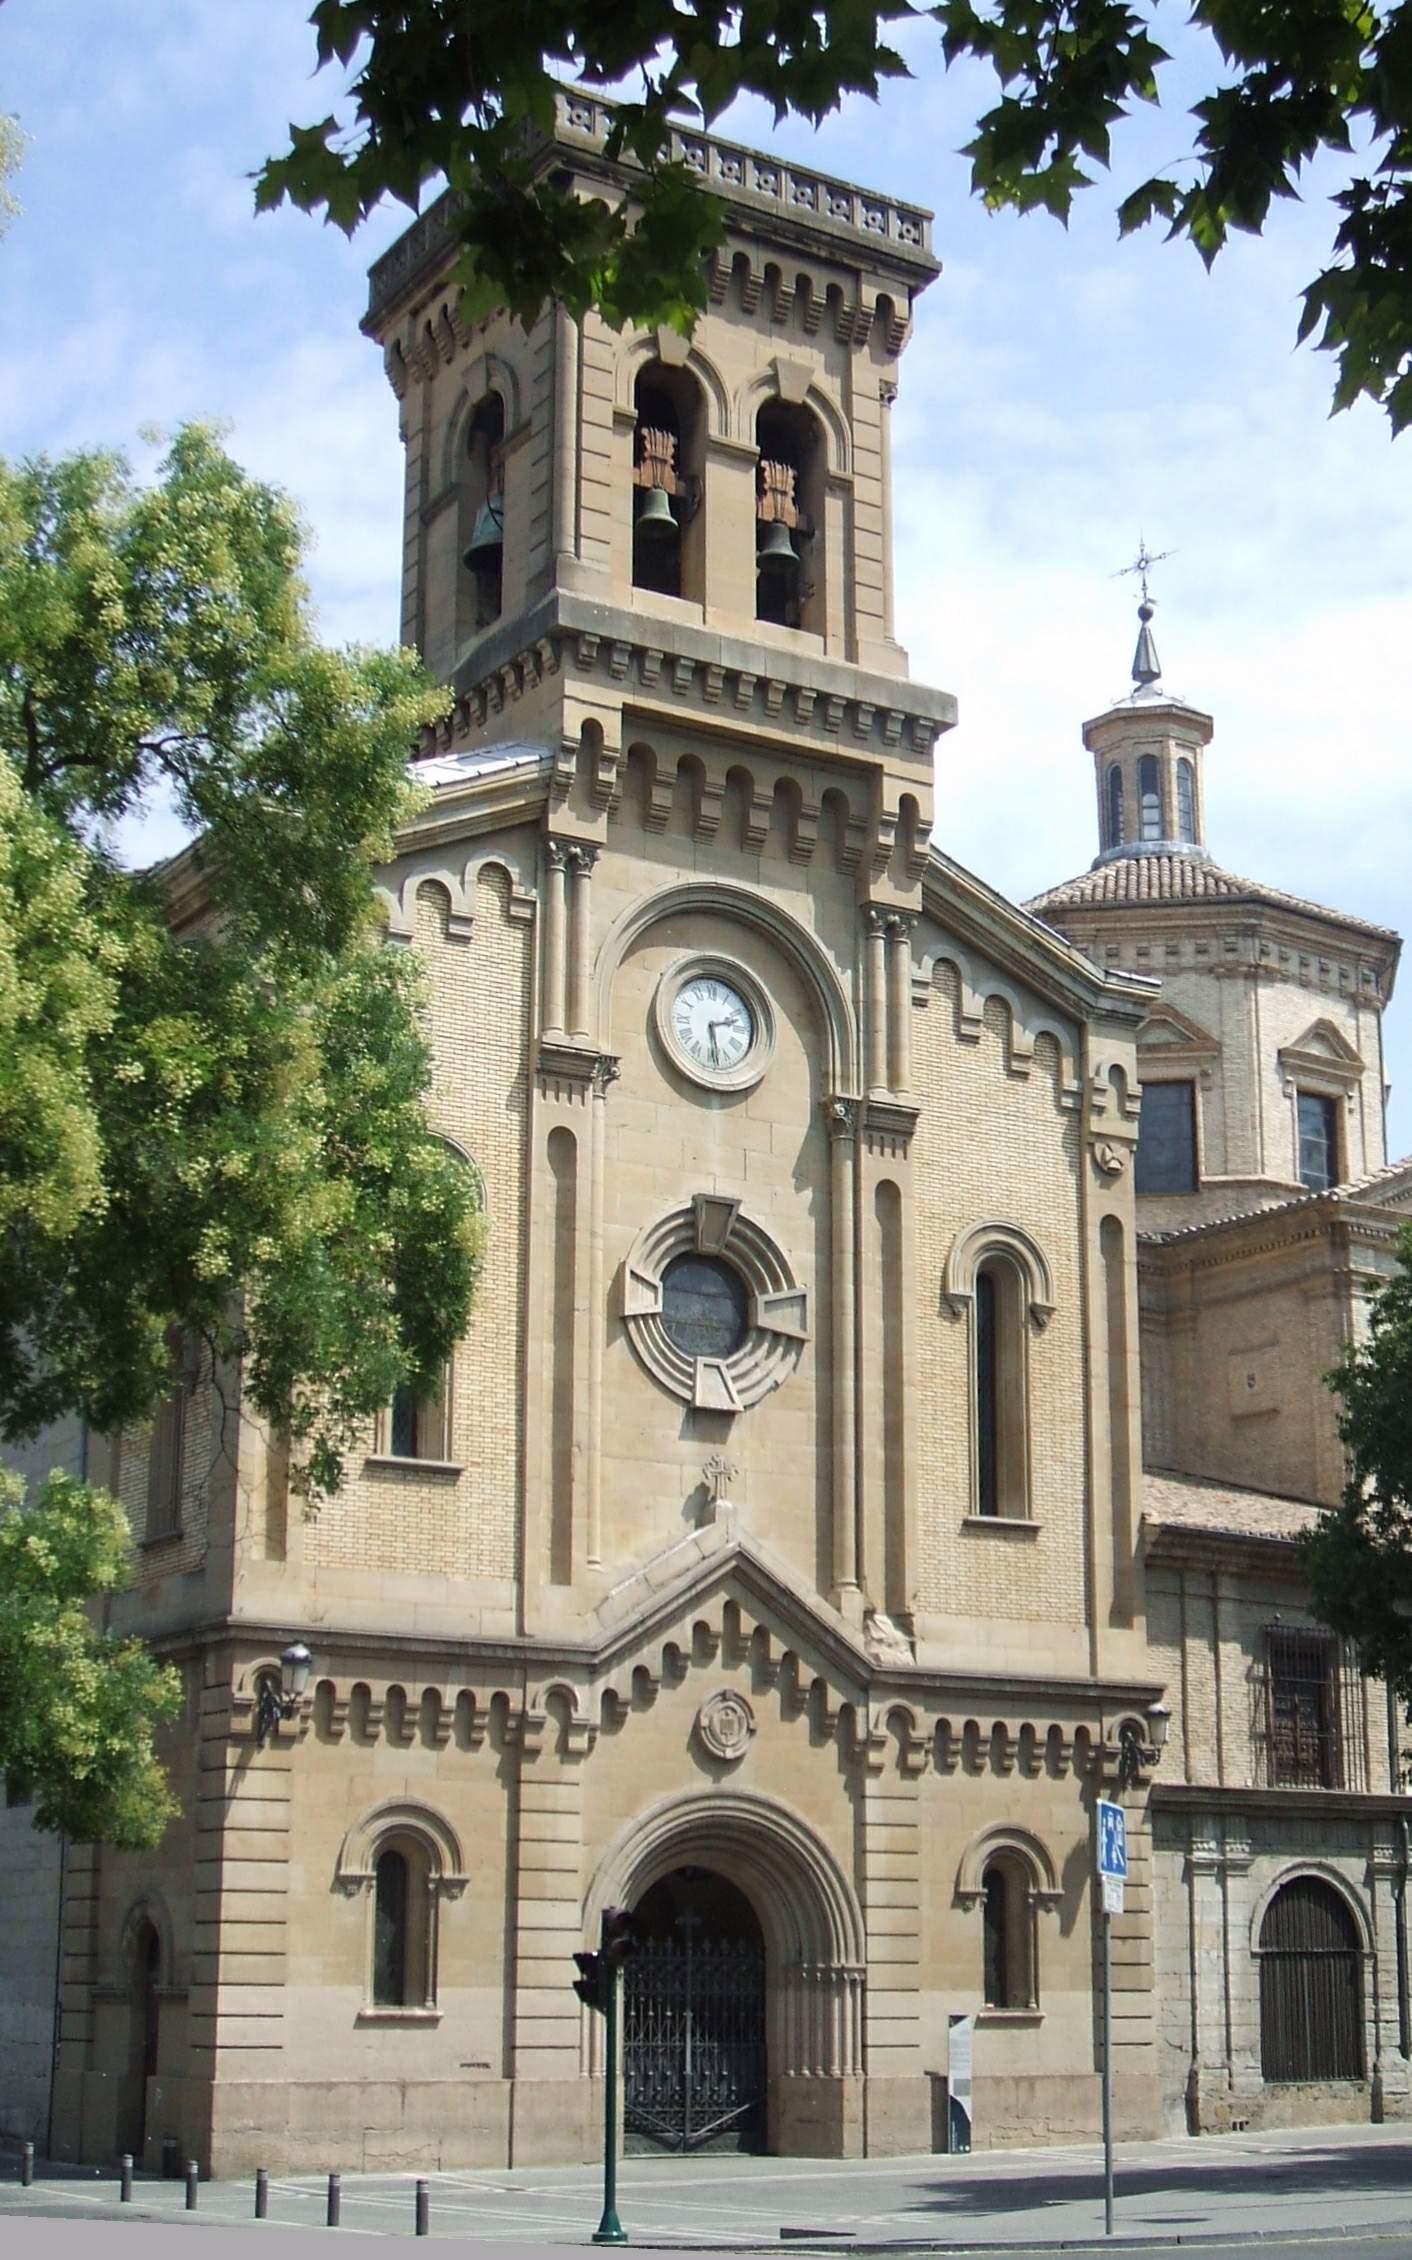 File:Pamplona - Iglesia de San Lorenzo 12.JPG - Wikimedia Commons